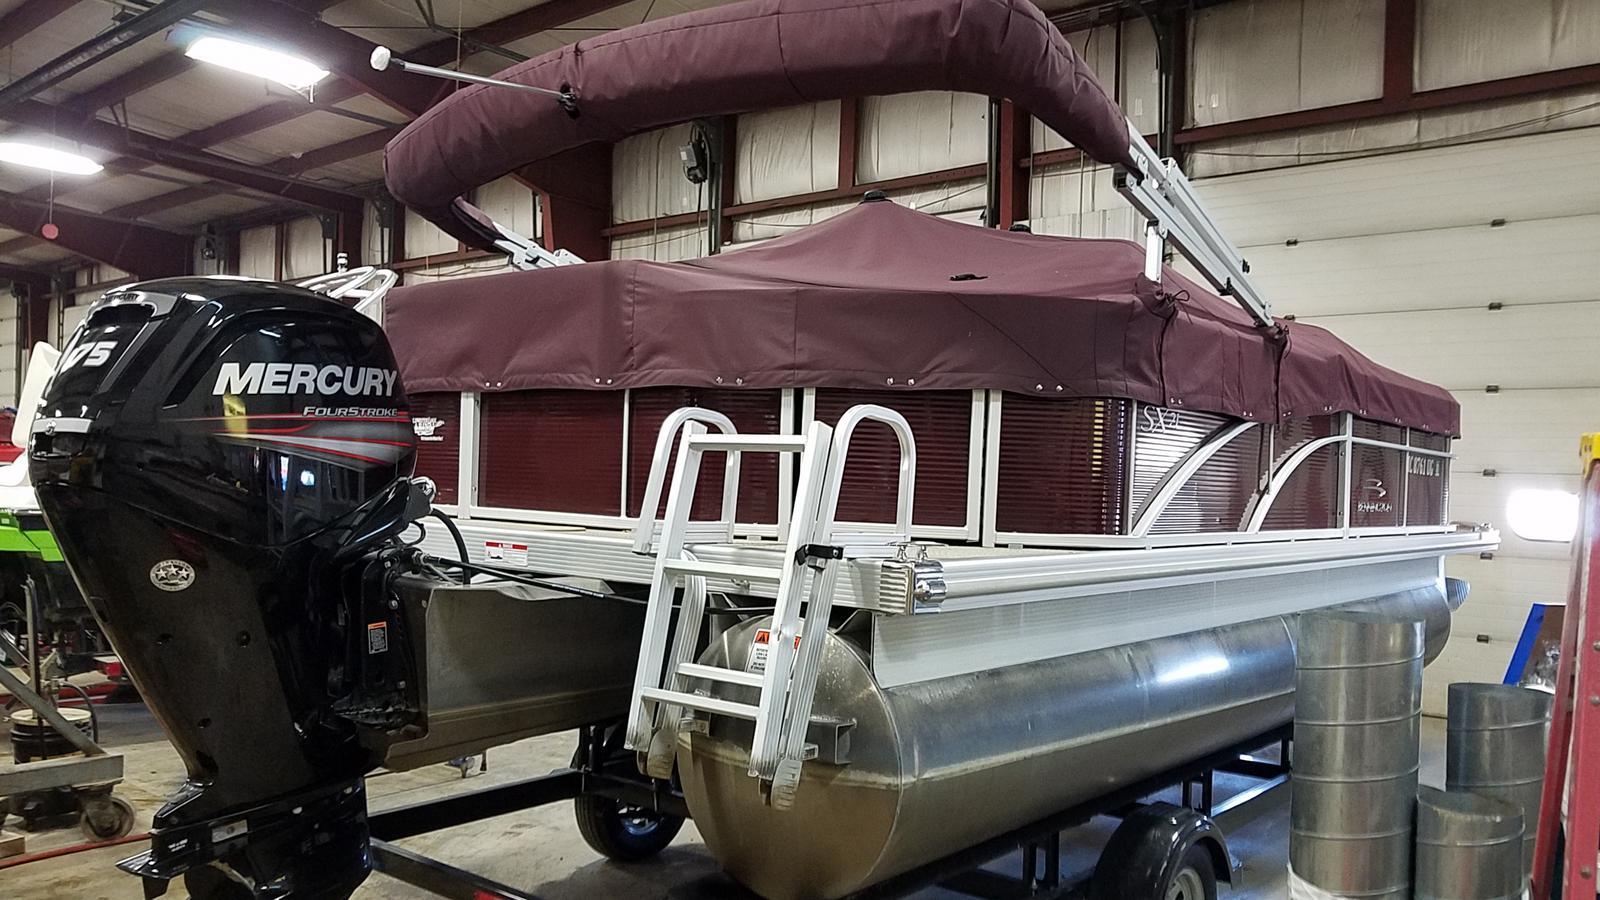 2019 Bennington boat for sale, model of the boat is 21 SLX & Image # 2 of 15